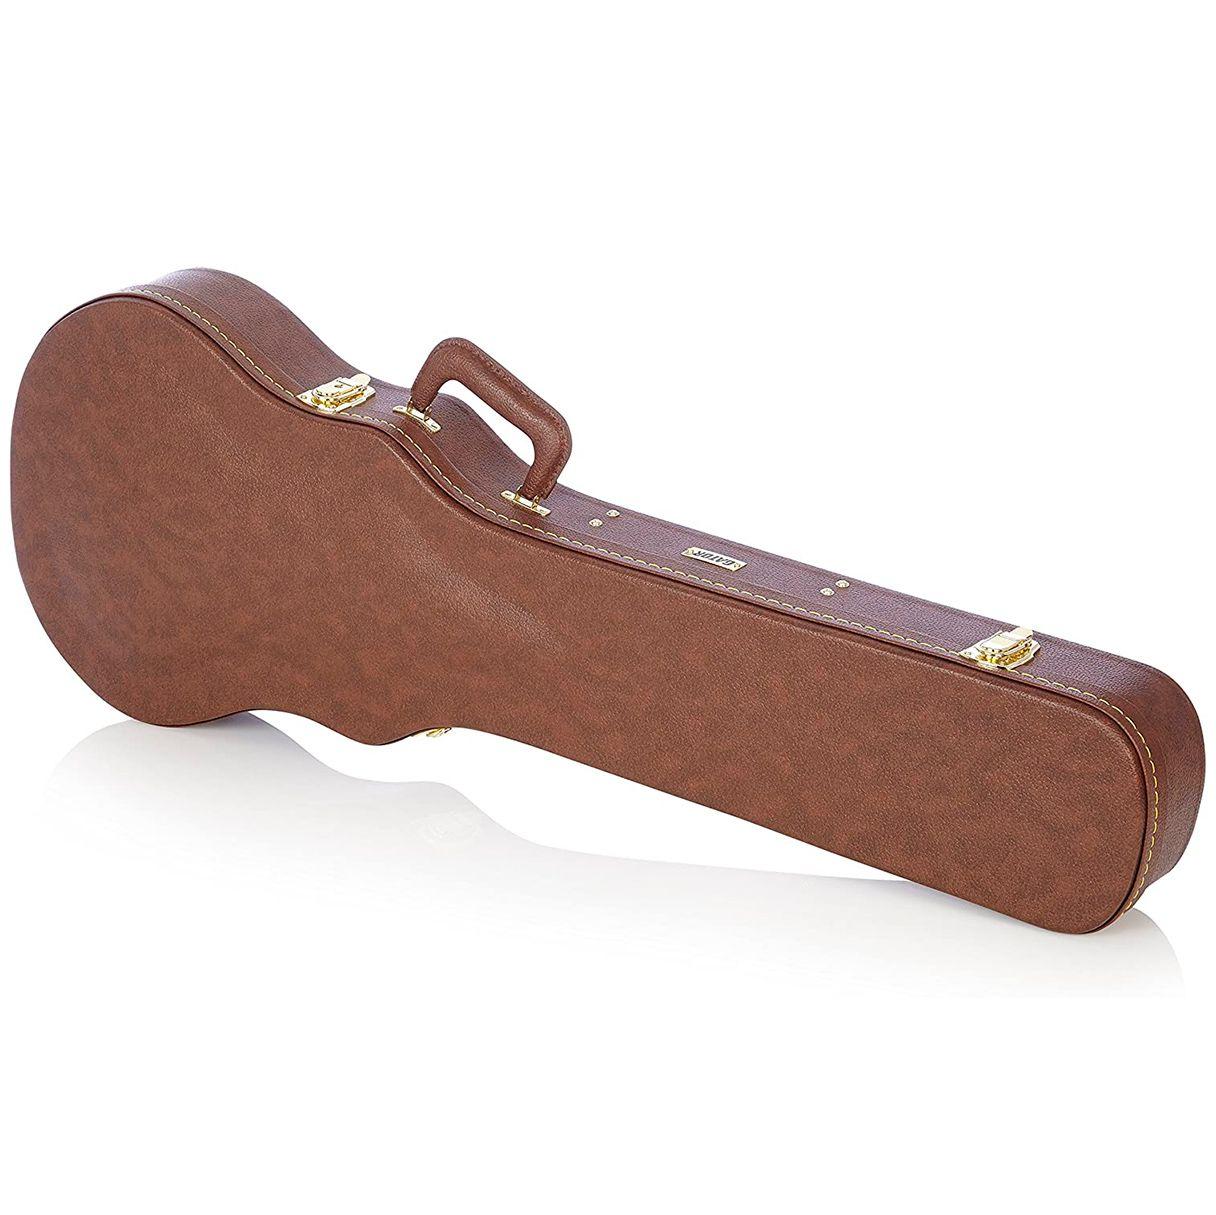 Case Gator GW-LP-Brown em Madeira para Guitarra Les Paul